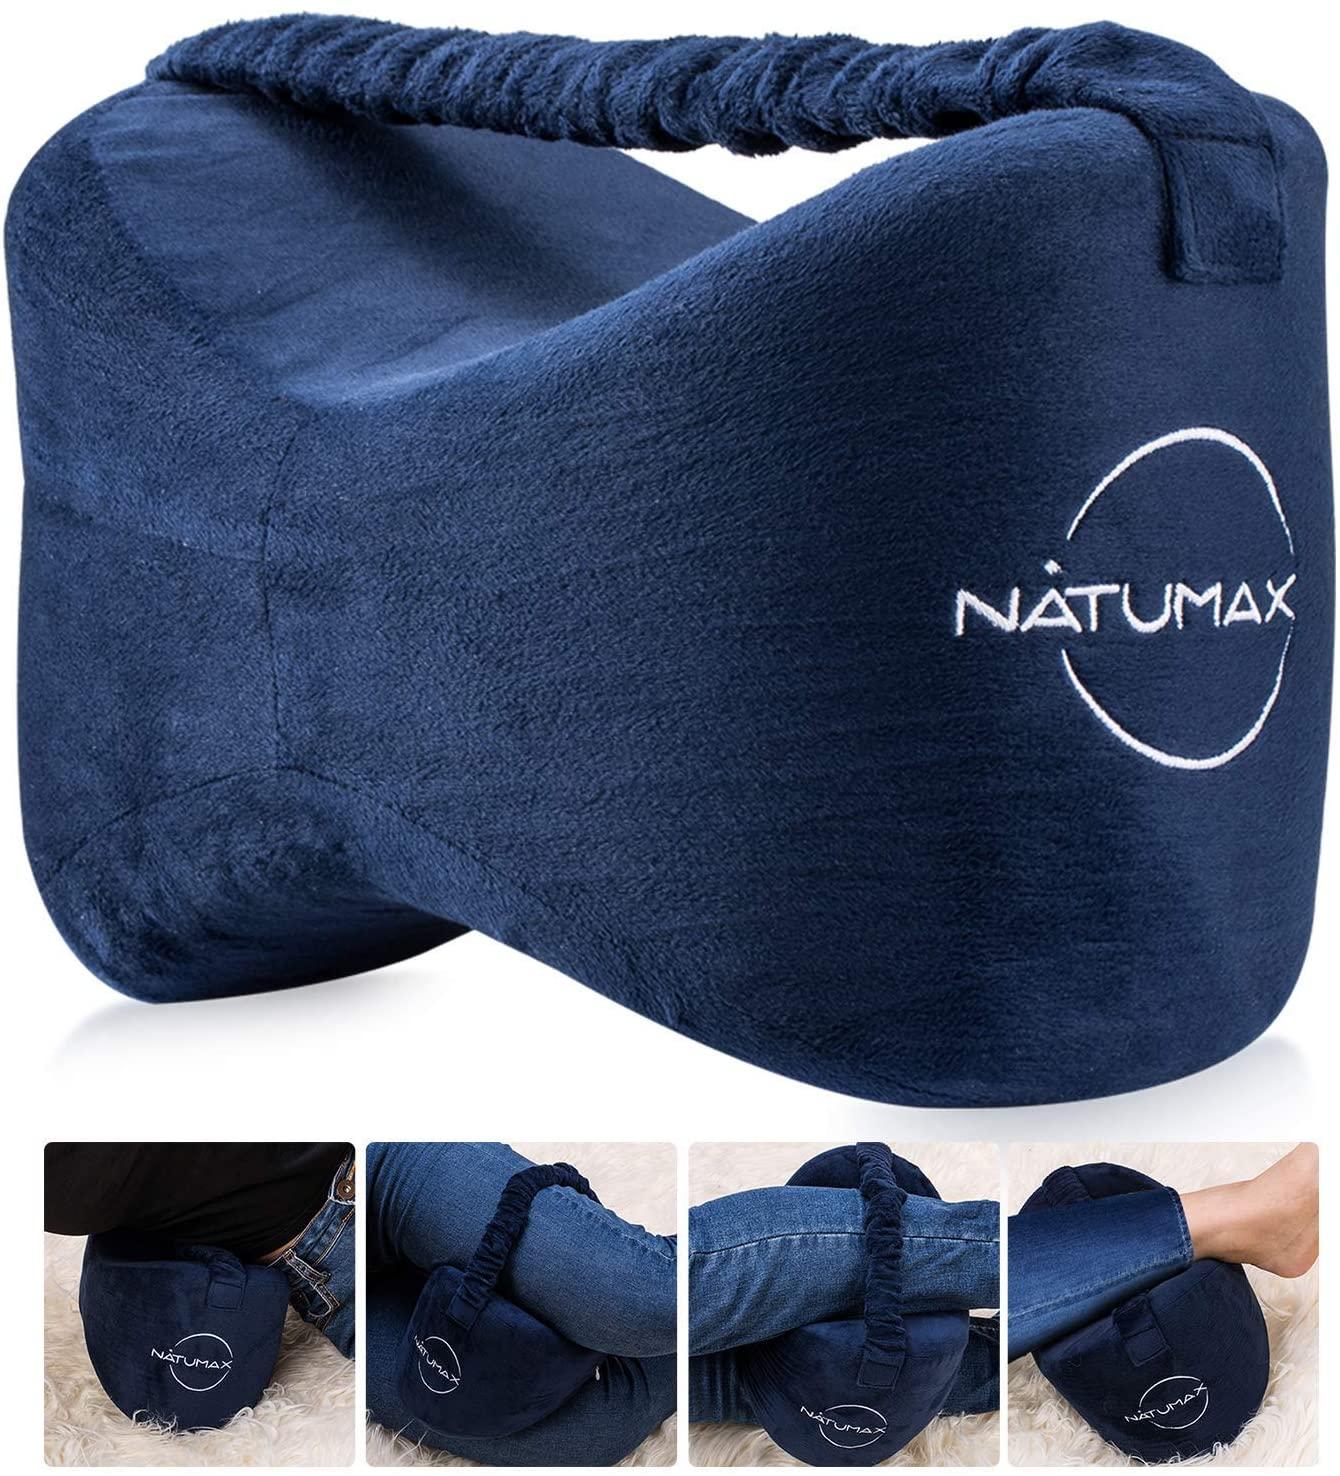 NATUMAX Knee Pillow Side Sleepers